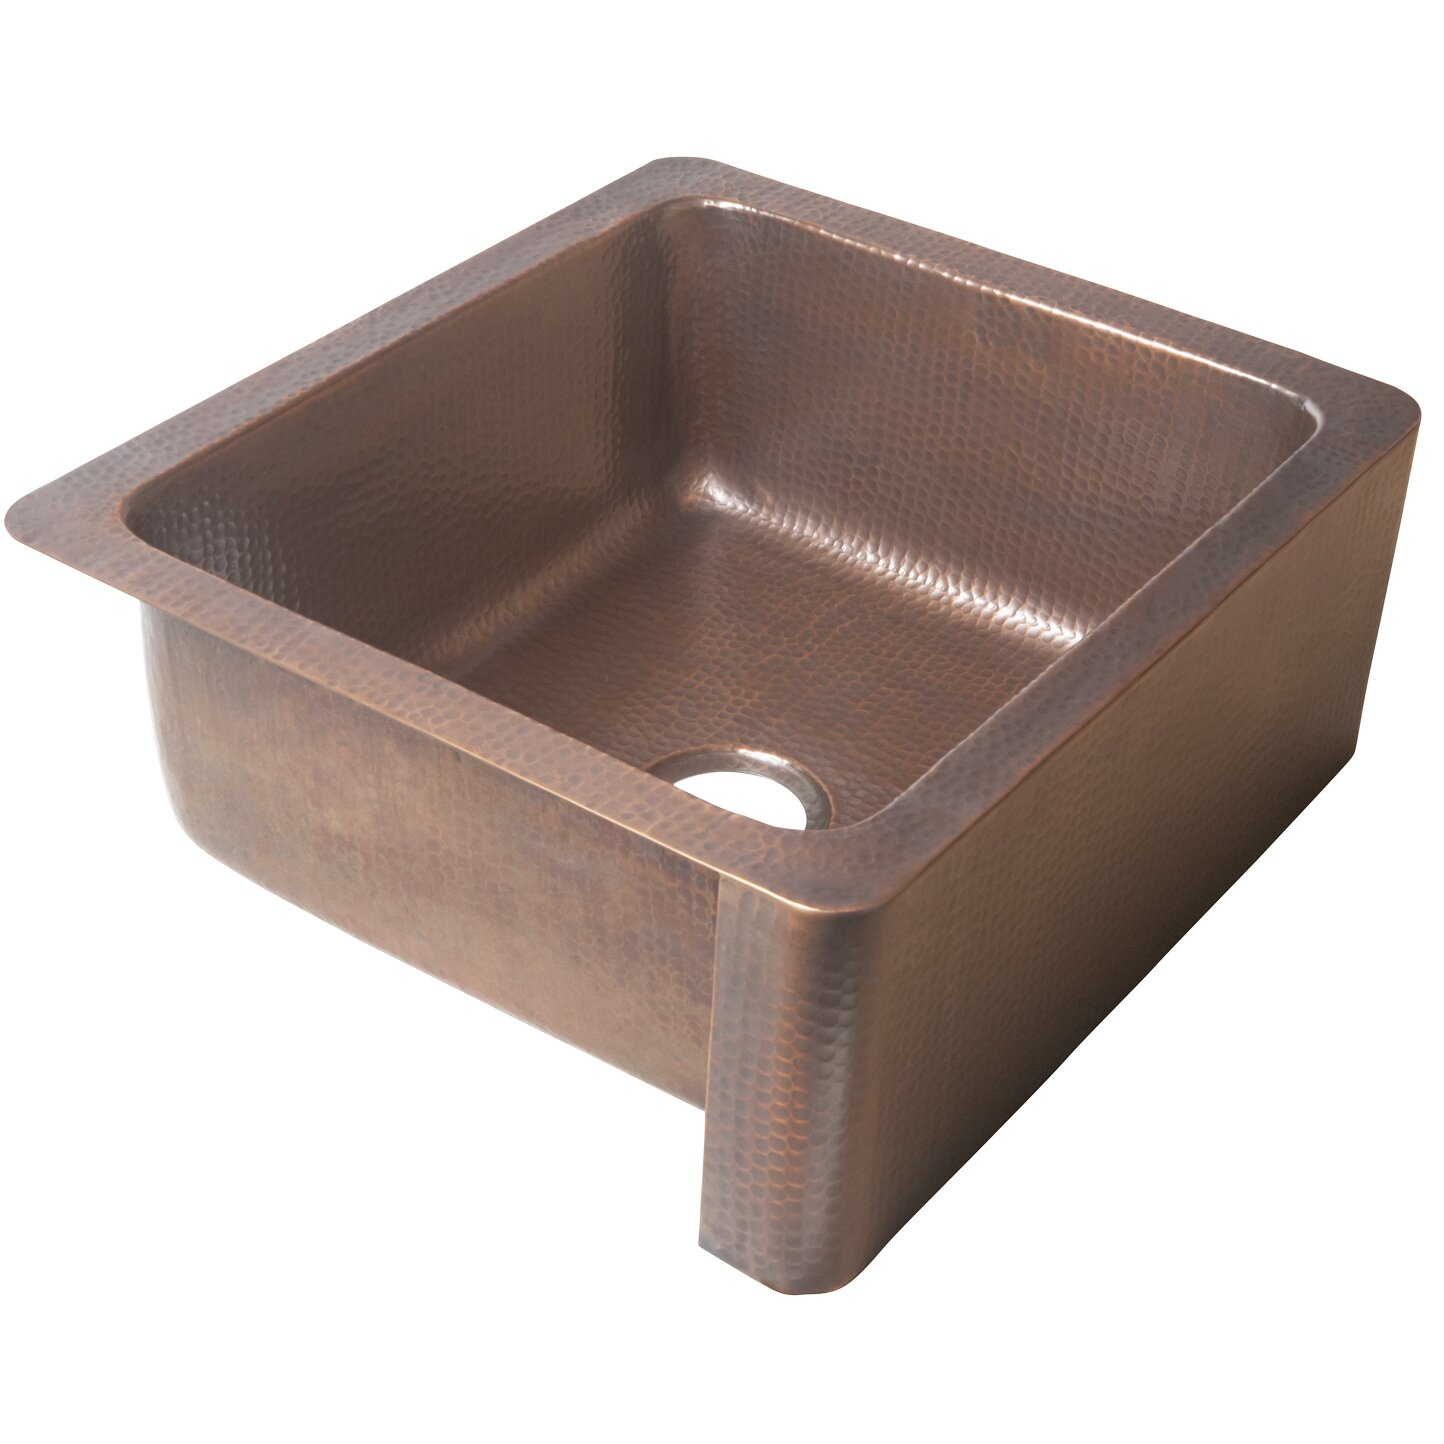 monet 25 x 22 farmhouse handmade copper kitchen sink